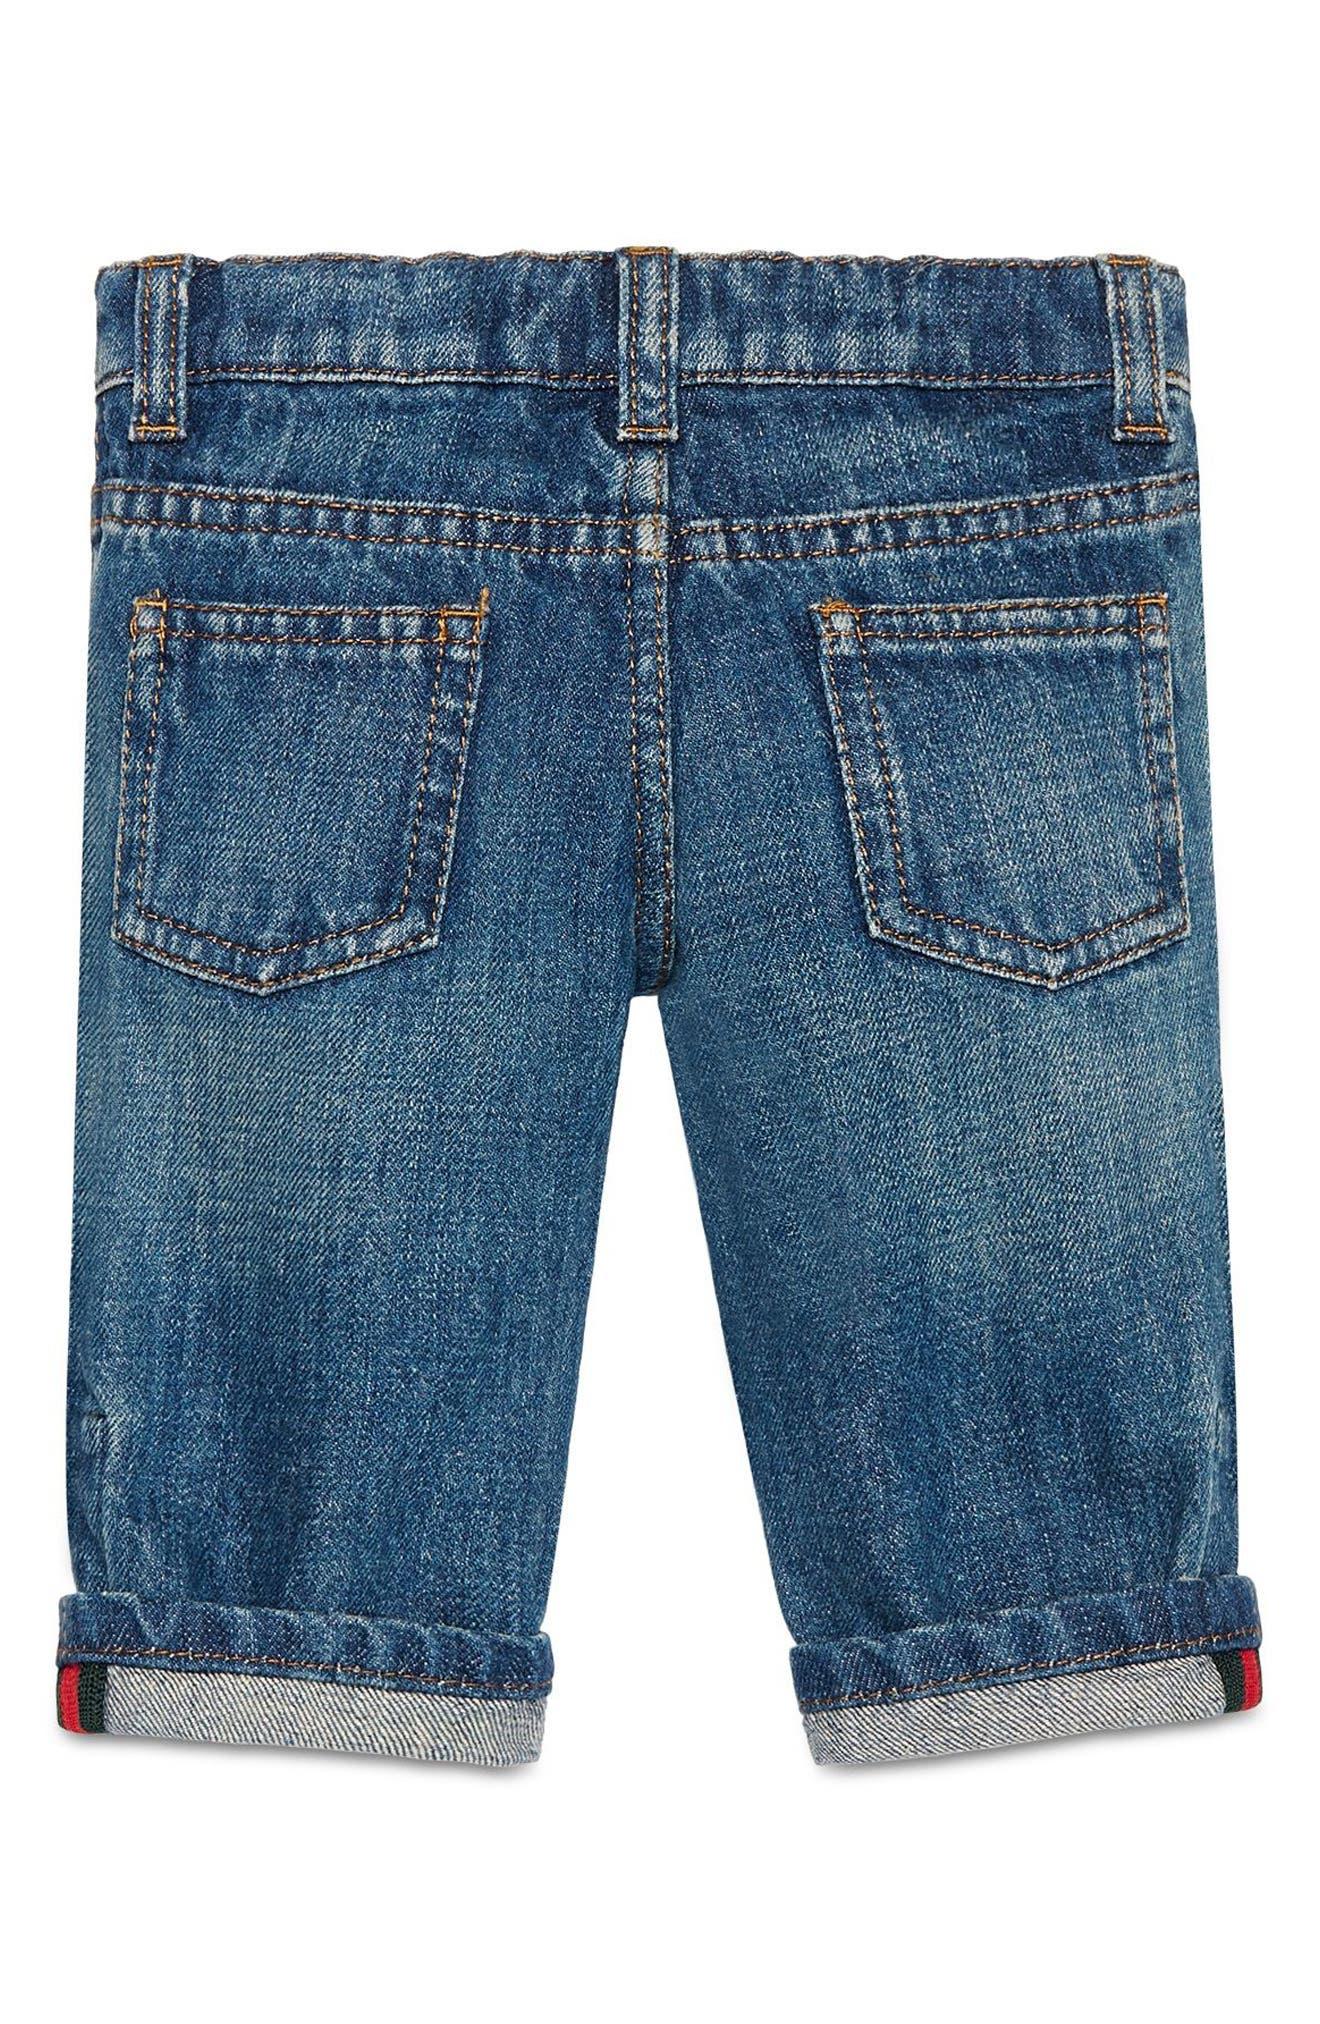 Straight Leg Jeans,                             Main thumbnail 1, color,                             401